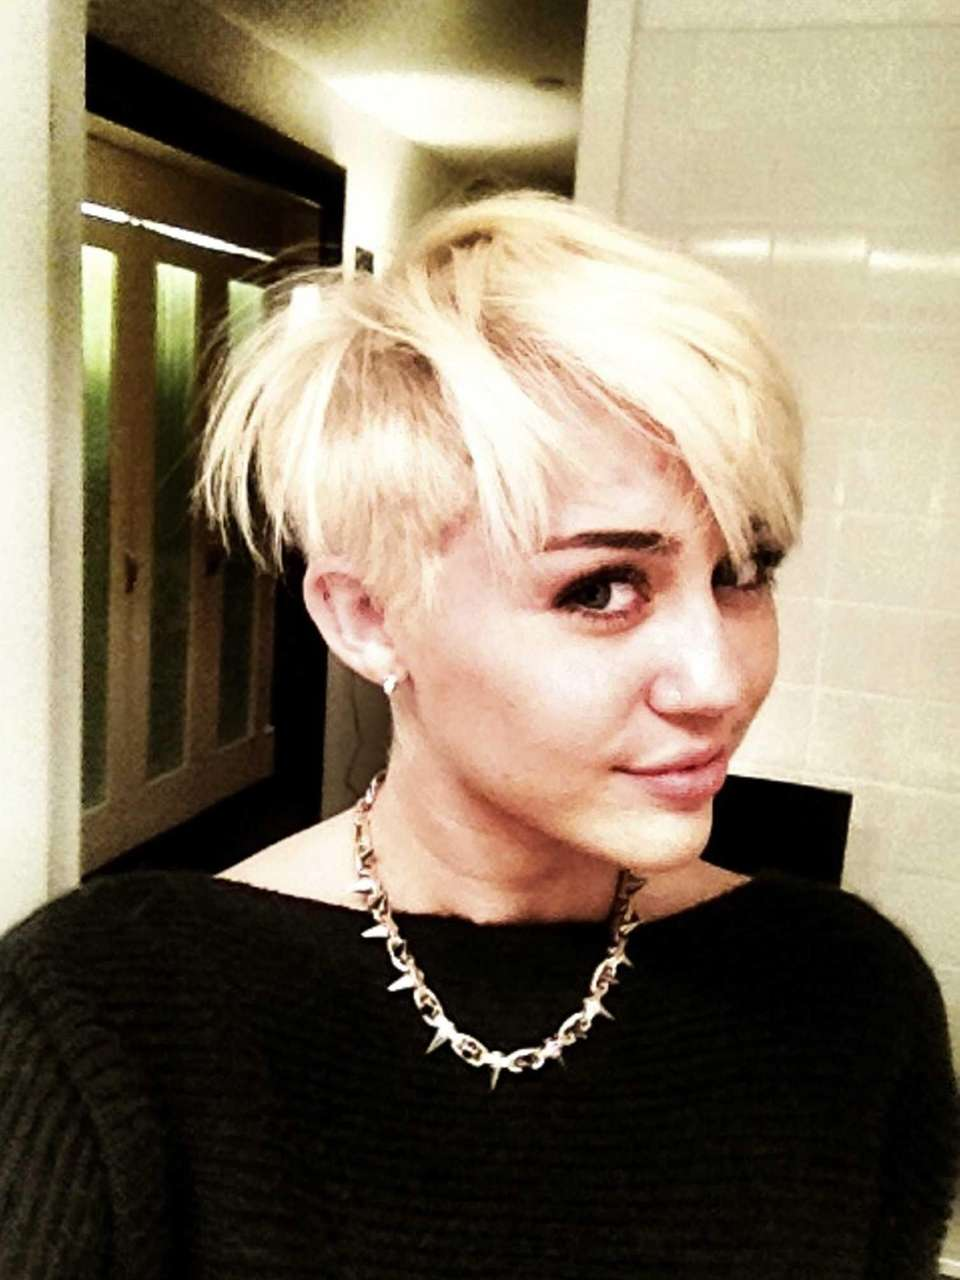 Miley Cyrus sports a new, short cut.